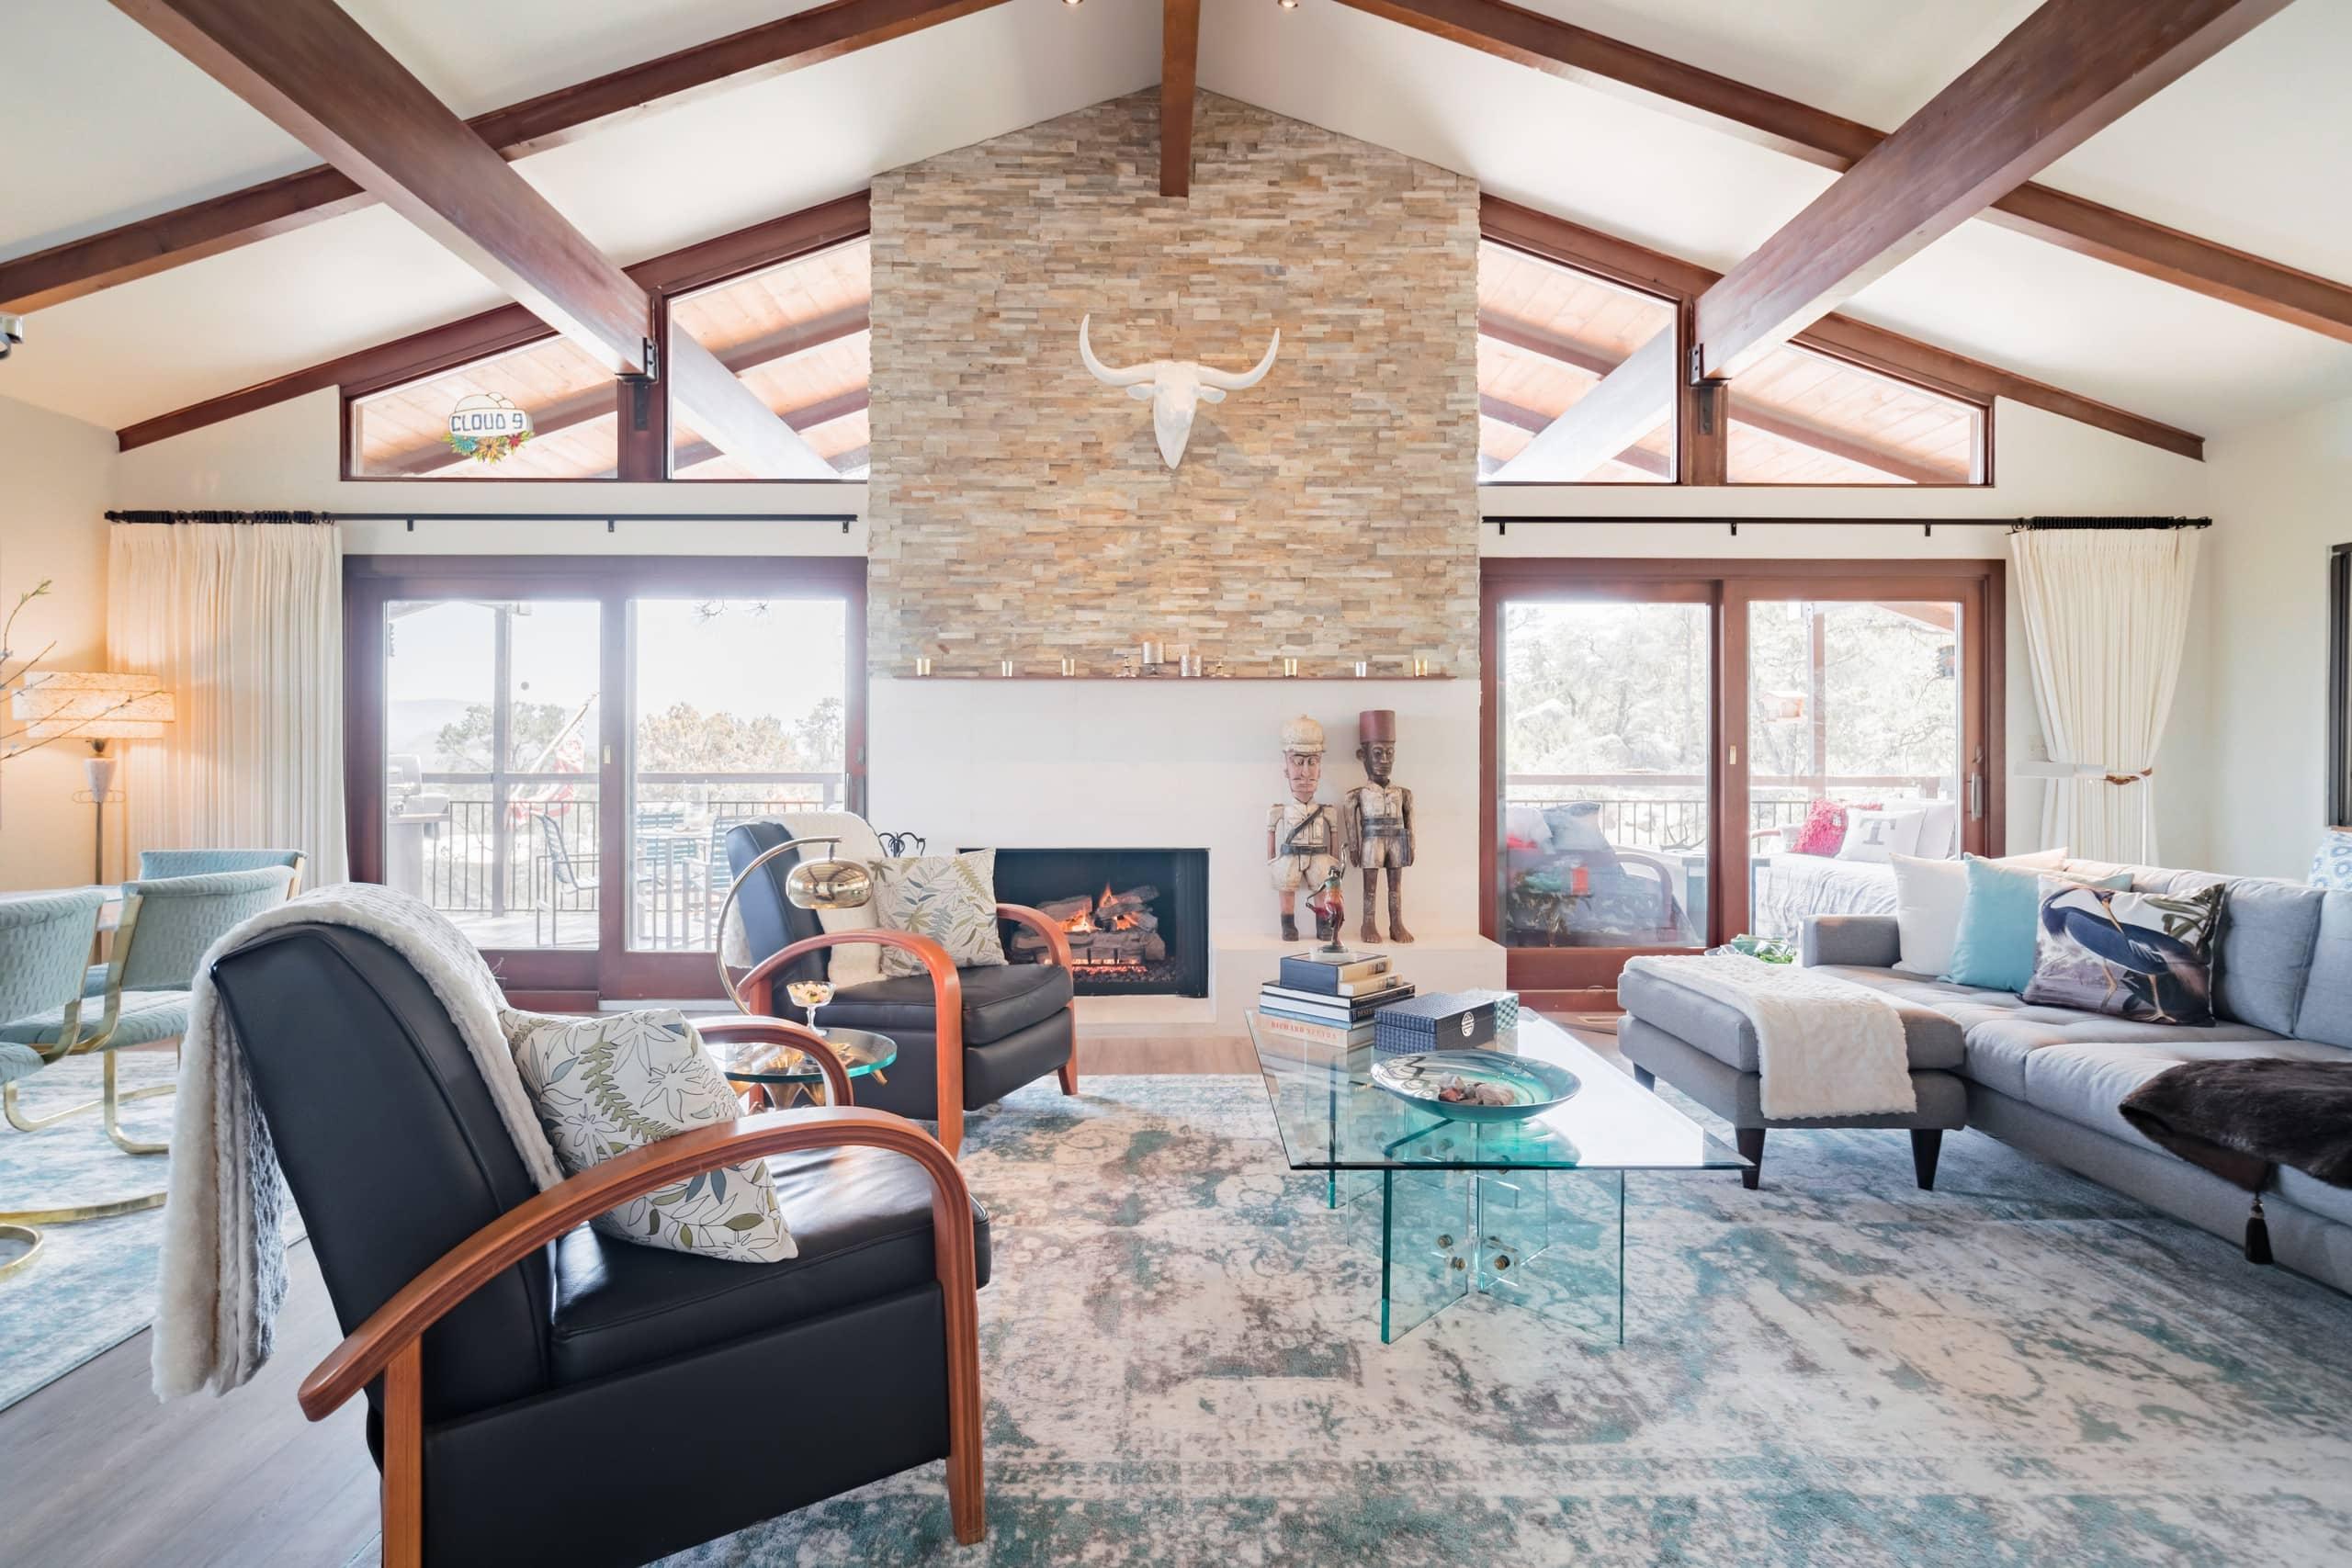 Cloud Nine Airbnb Plus - Houses for Rent in Prescott ...